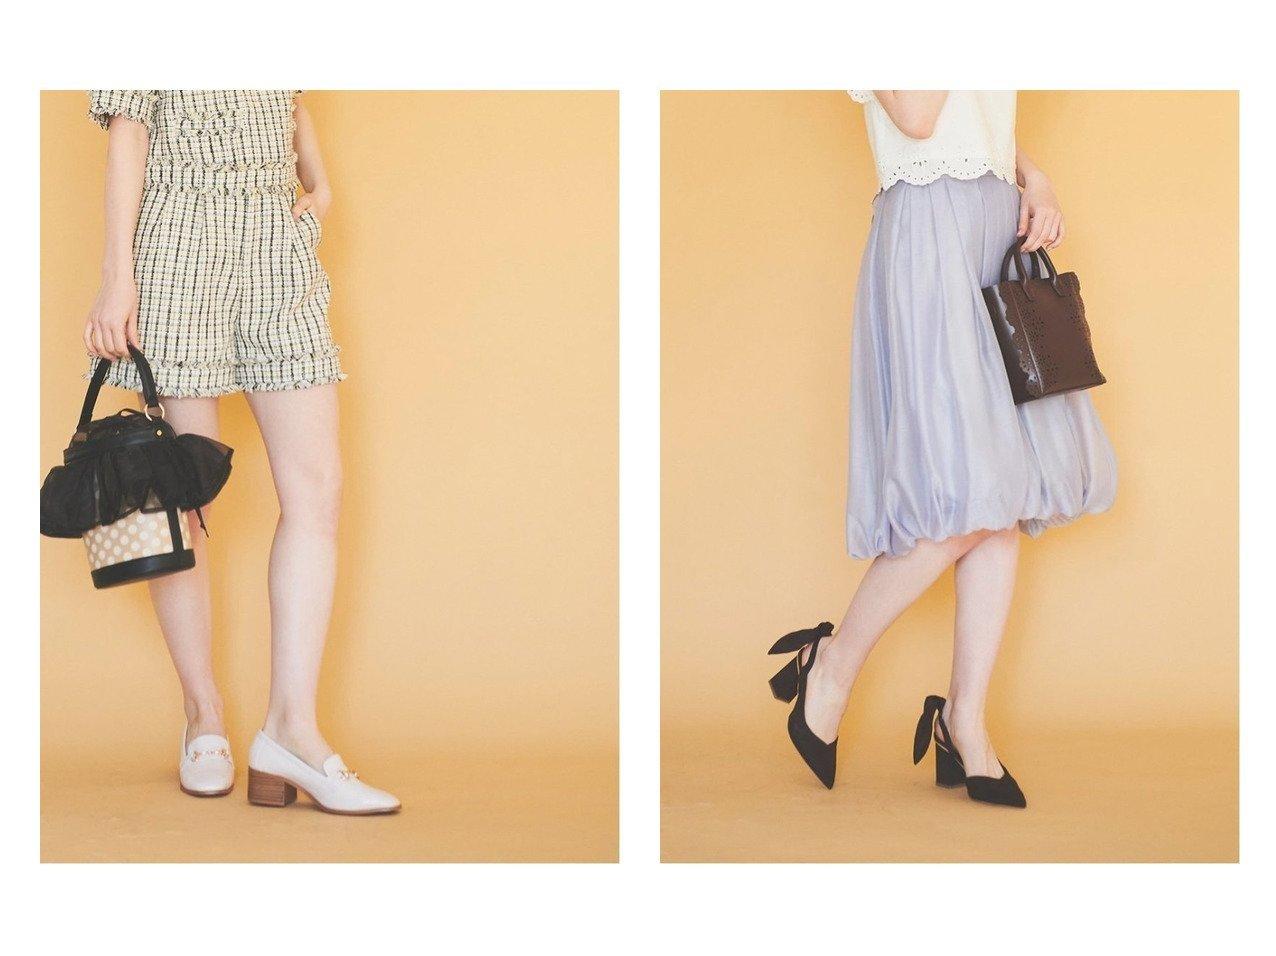 【31 Sons de mode/トランテアン ソン ドゥ モード】のフェイクスエードバックリボンストラップパンプス&フェイククロコピッドローファー シューズ・靴のおすすめ!人気、トレンド・レディースファッションの通販  おすすめで人気の流行・トレンド、ファッションの通販商品 メンズファッション・キッズファッション・インテリア・家具・レディースファッション・服の通販 founy(ファニー) https://founy.com/ ファッション Fashion レディースファッション WOMEN 2021年 2021 2021 春夏 S/S SS Spring/Summer 2021 S/S 春夏 SS Spring/Summer クロコ シューズ フラット スカーフ スクエア フェイクスウェード リボン |ID:crp329100000009828